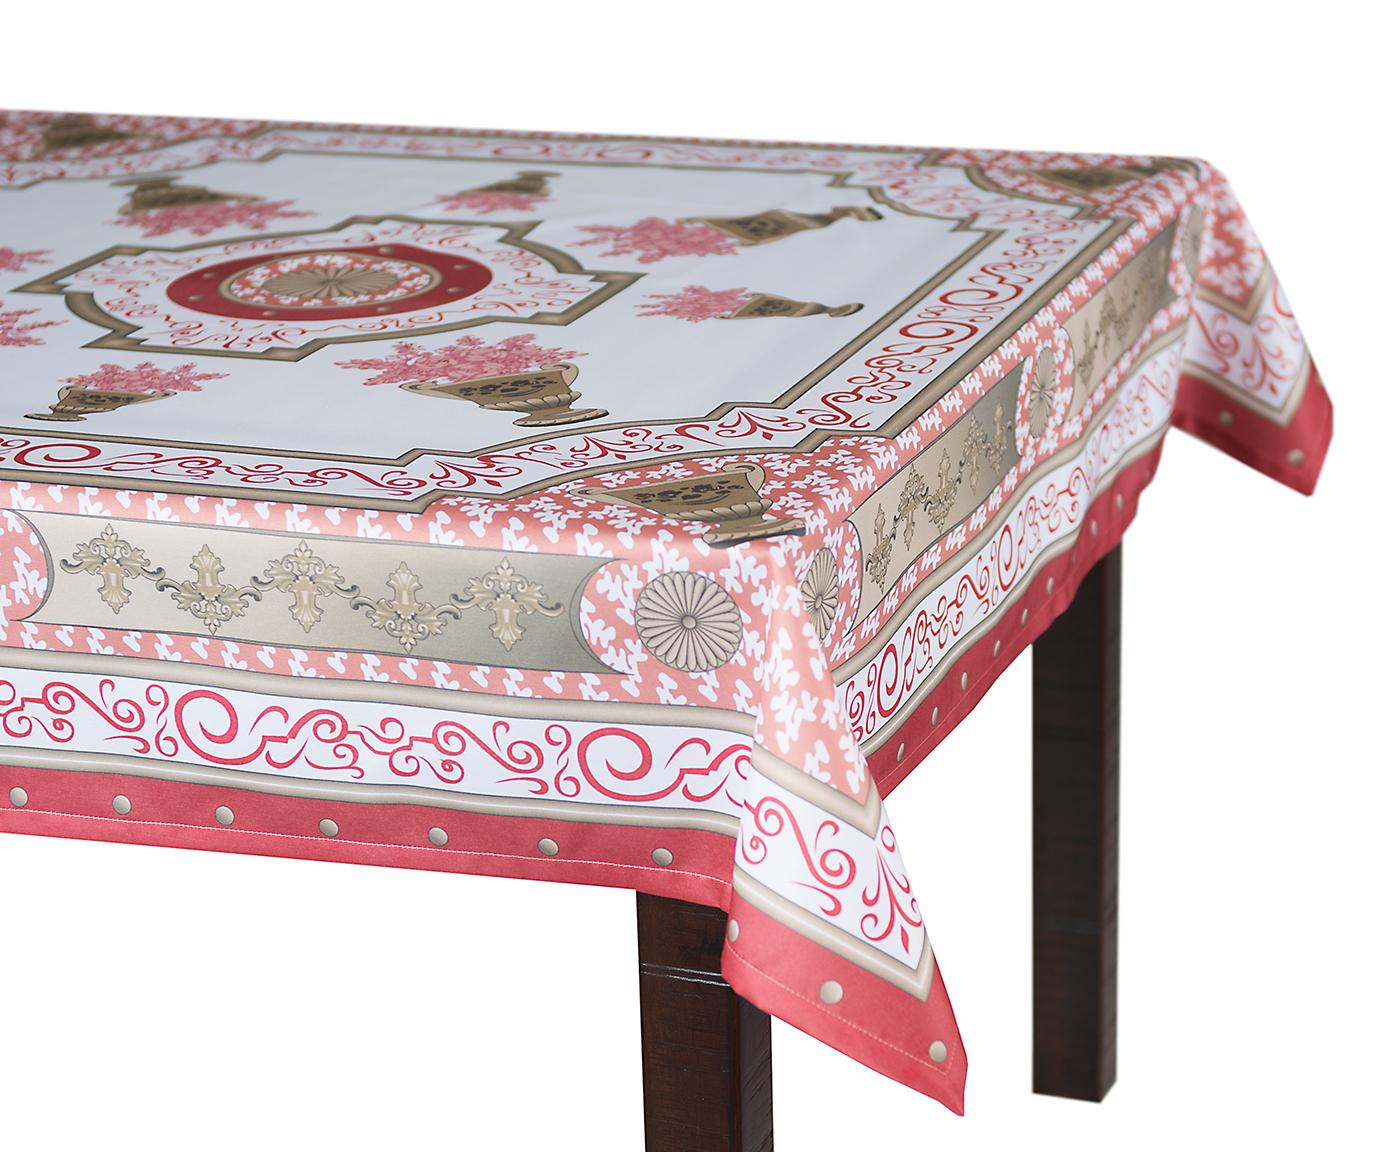 Кухня Скатерть 140x220 Blonder Home Rosetta розовая skatert-140x220-blonder-home-rosetta-rozovaya-ssha-rossiya.jpg